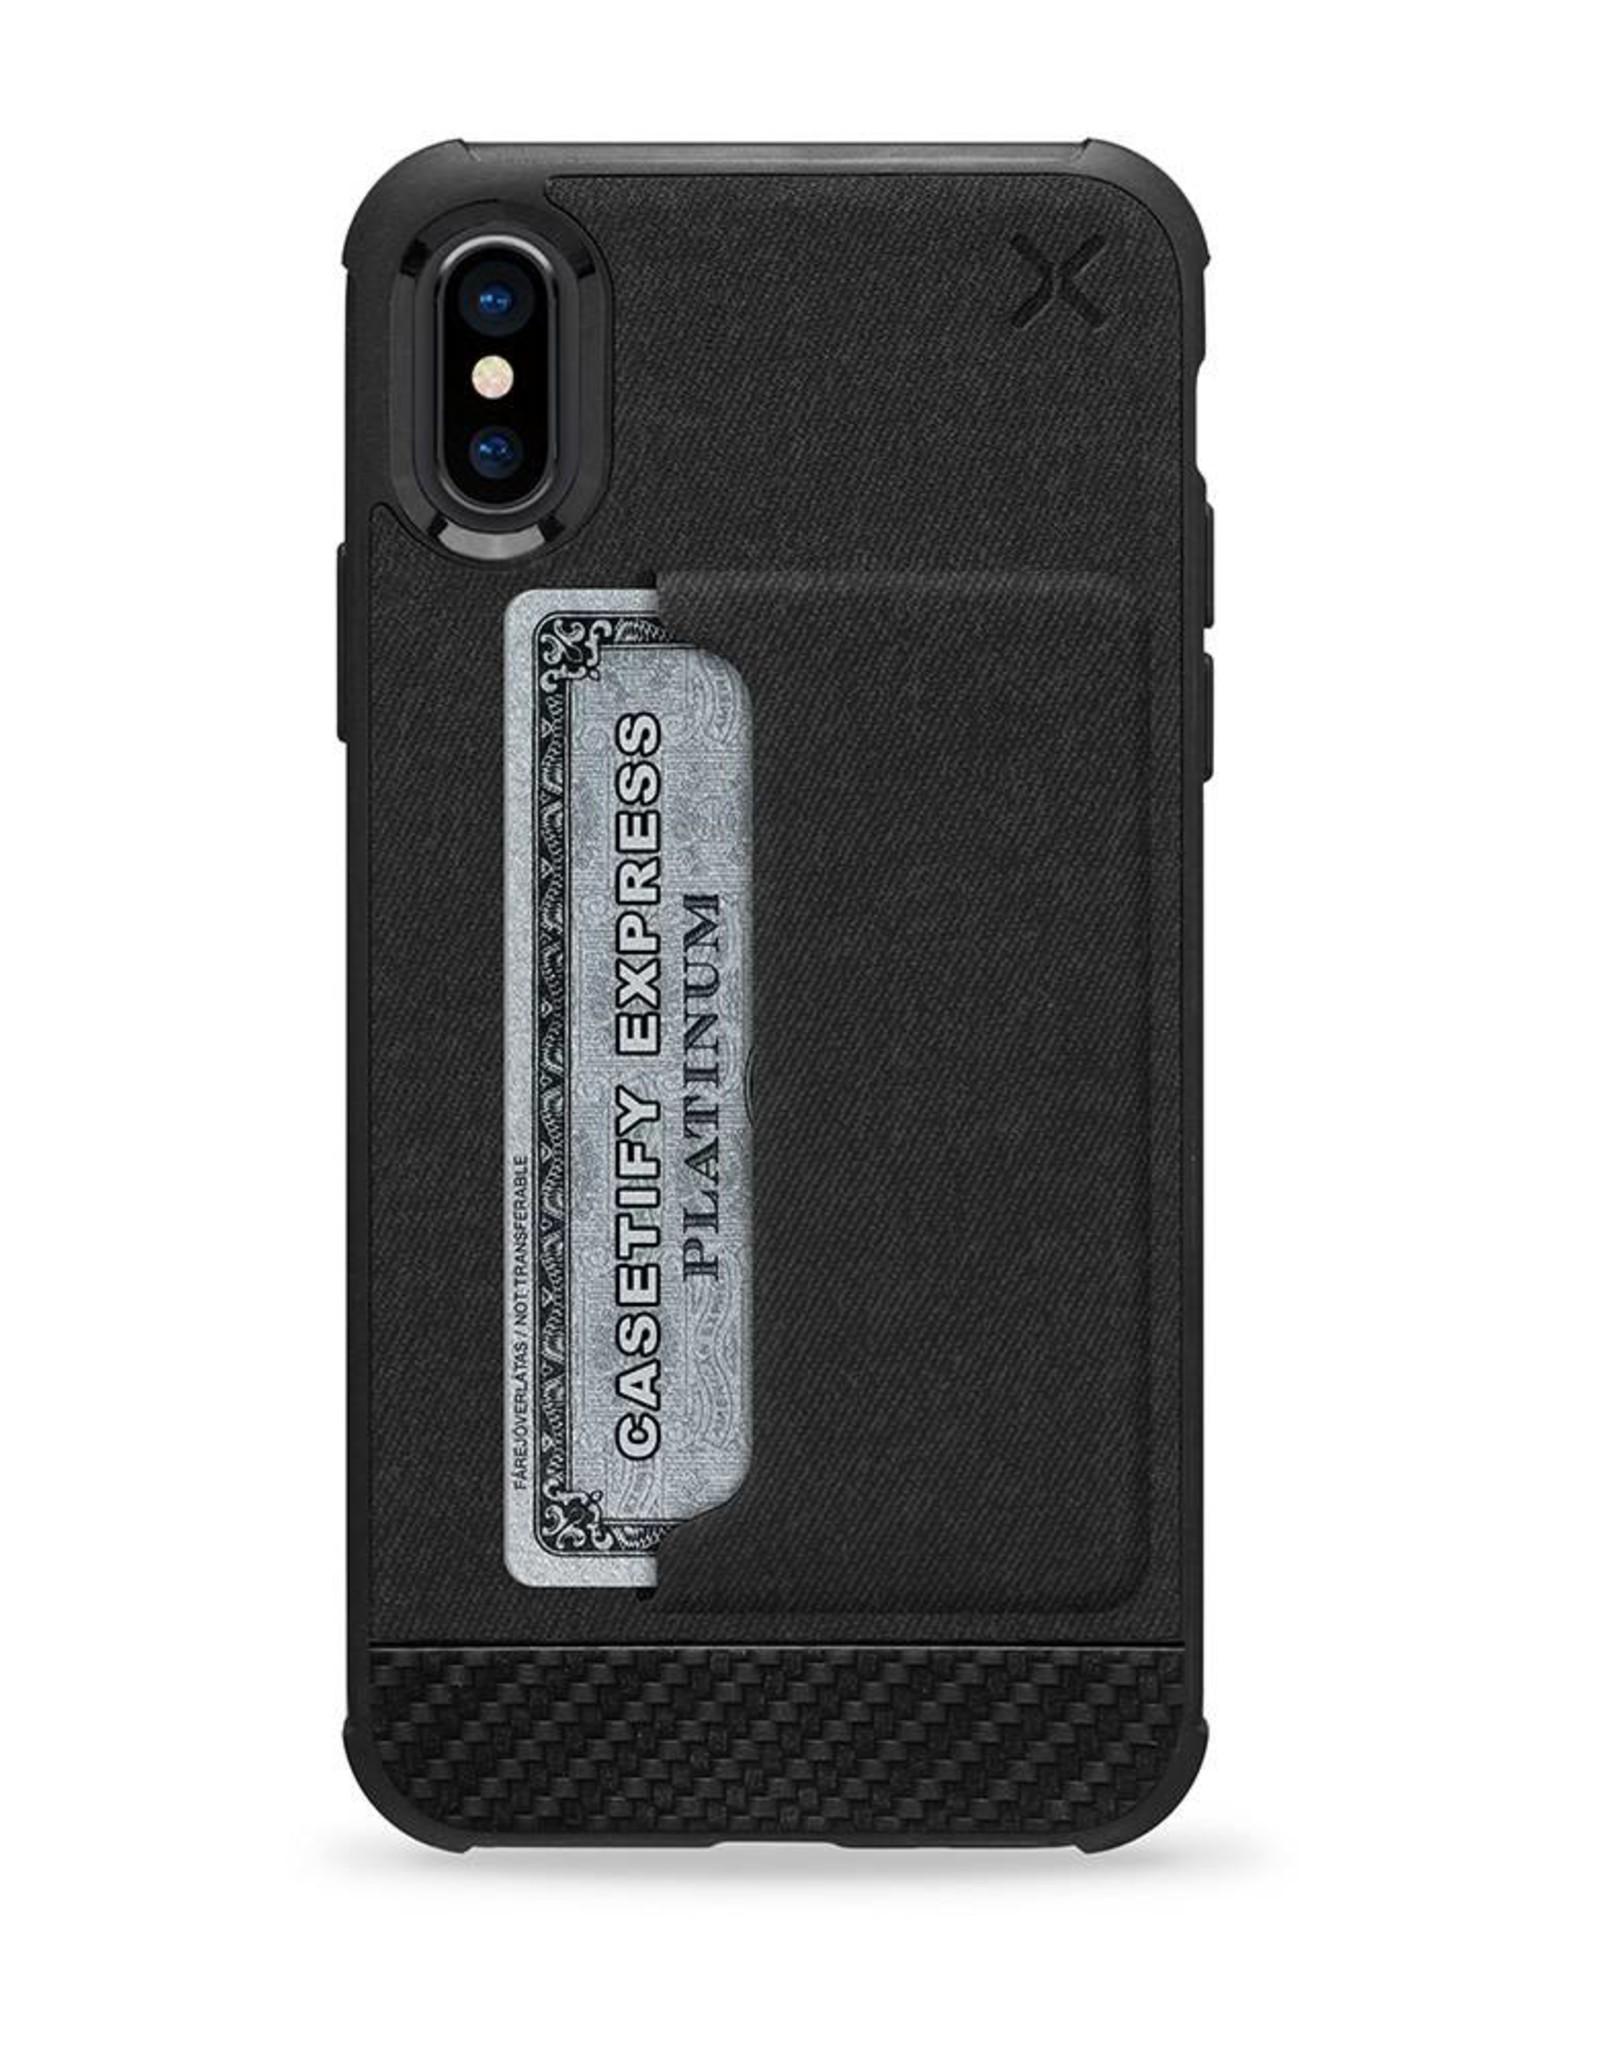 Casetify /// Casetify | iPhone X/Xs Essential Woven Pocket Case Matte Black | 120-0580